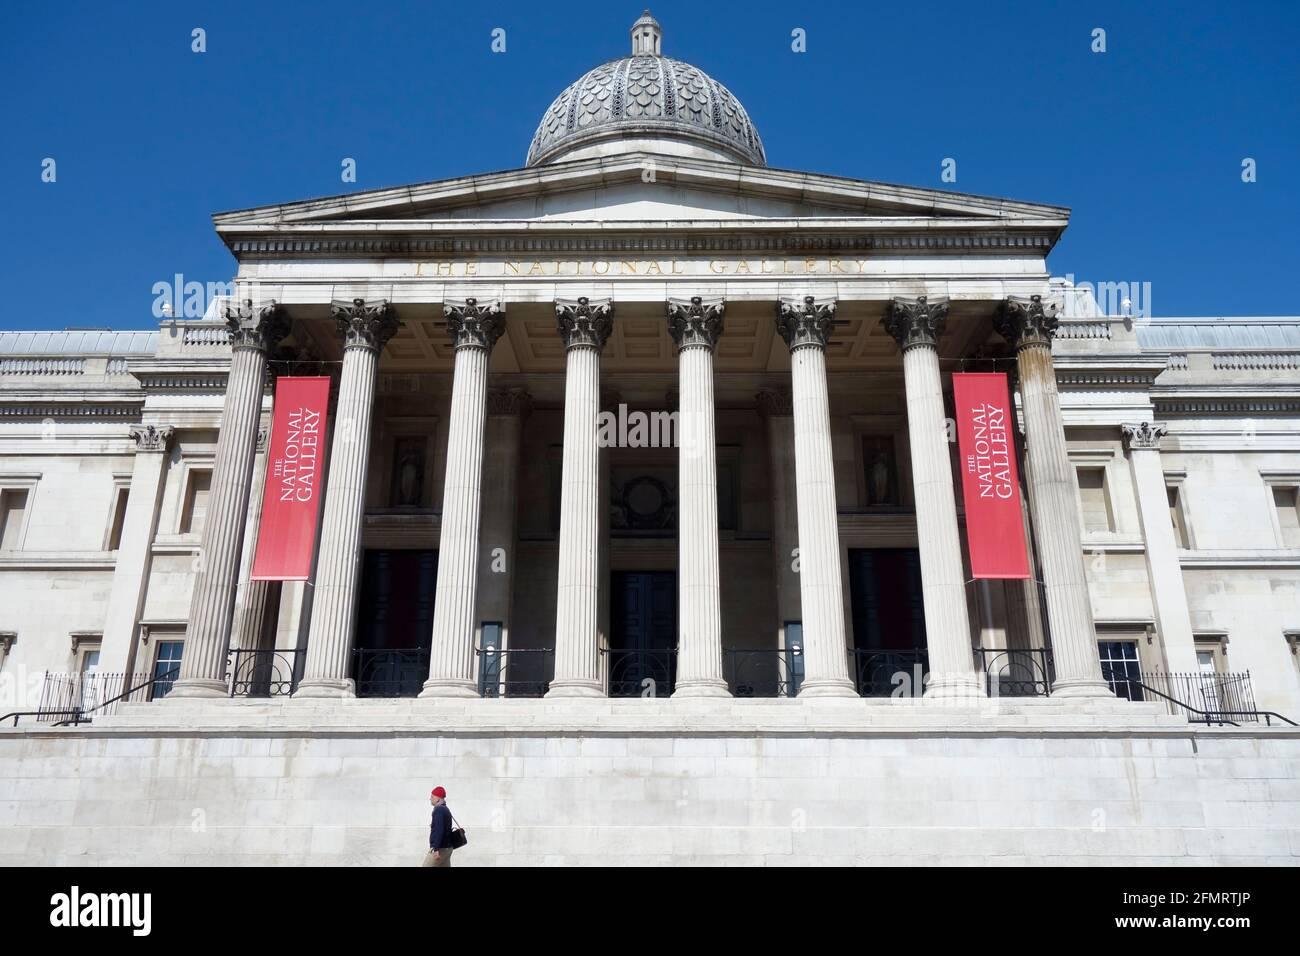 The National Gallery, Trafalgar Square, London, United Kingdom. Stock Photo